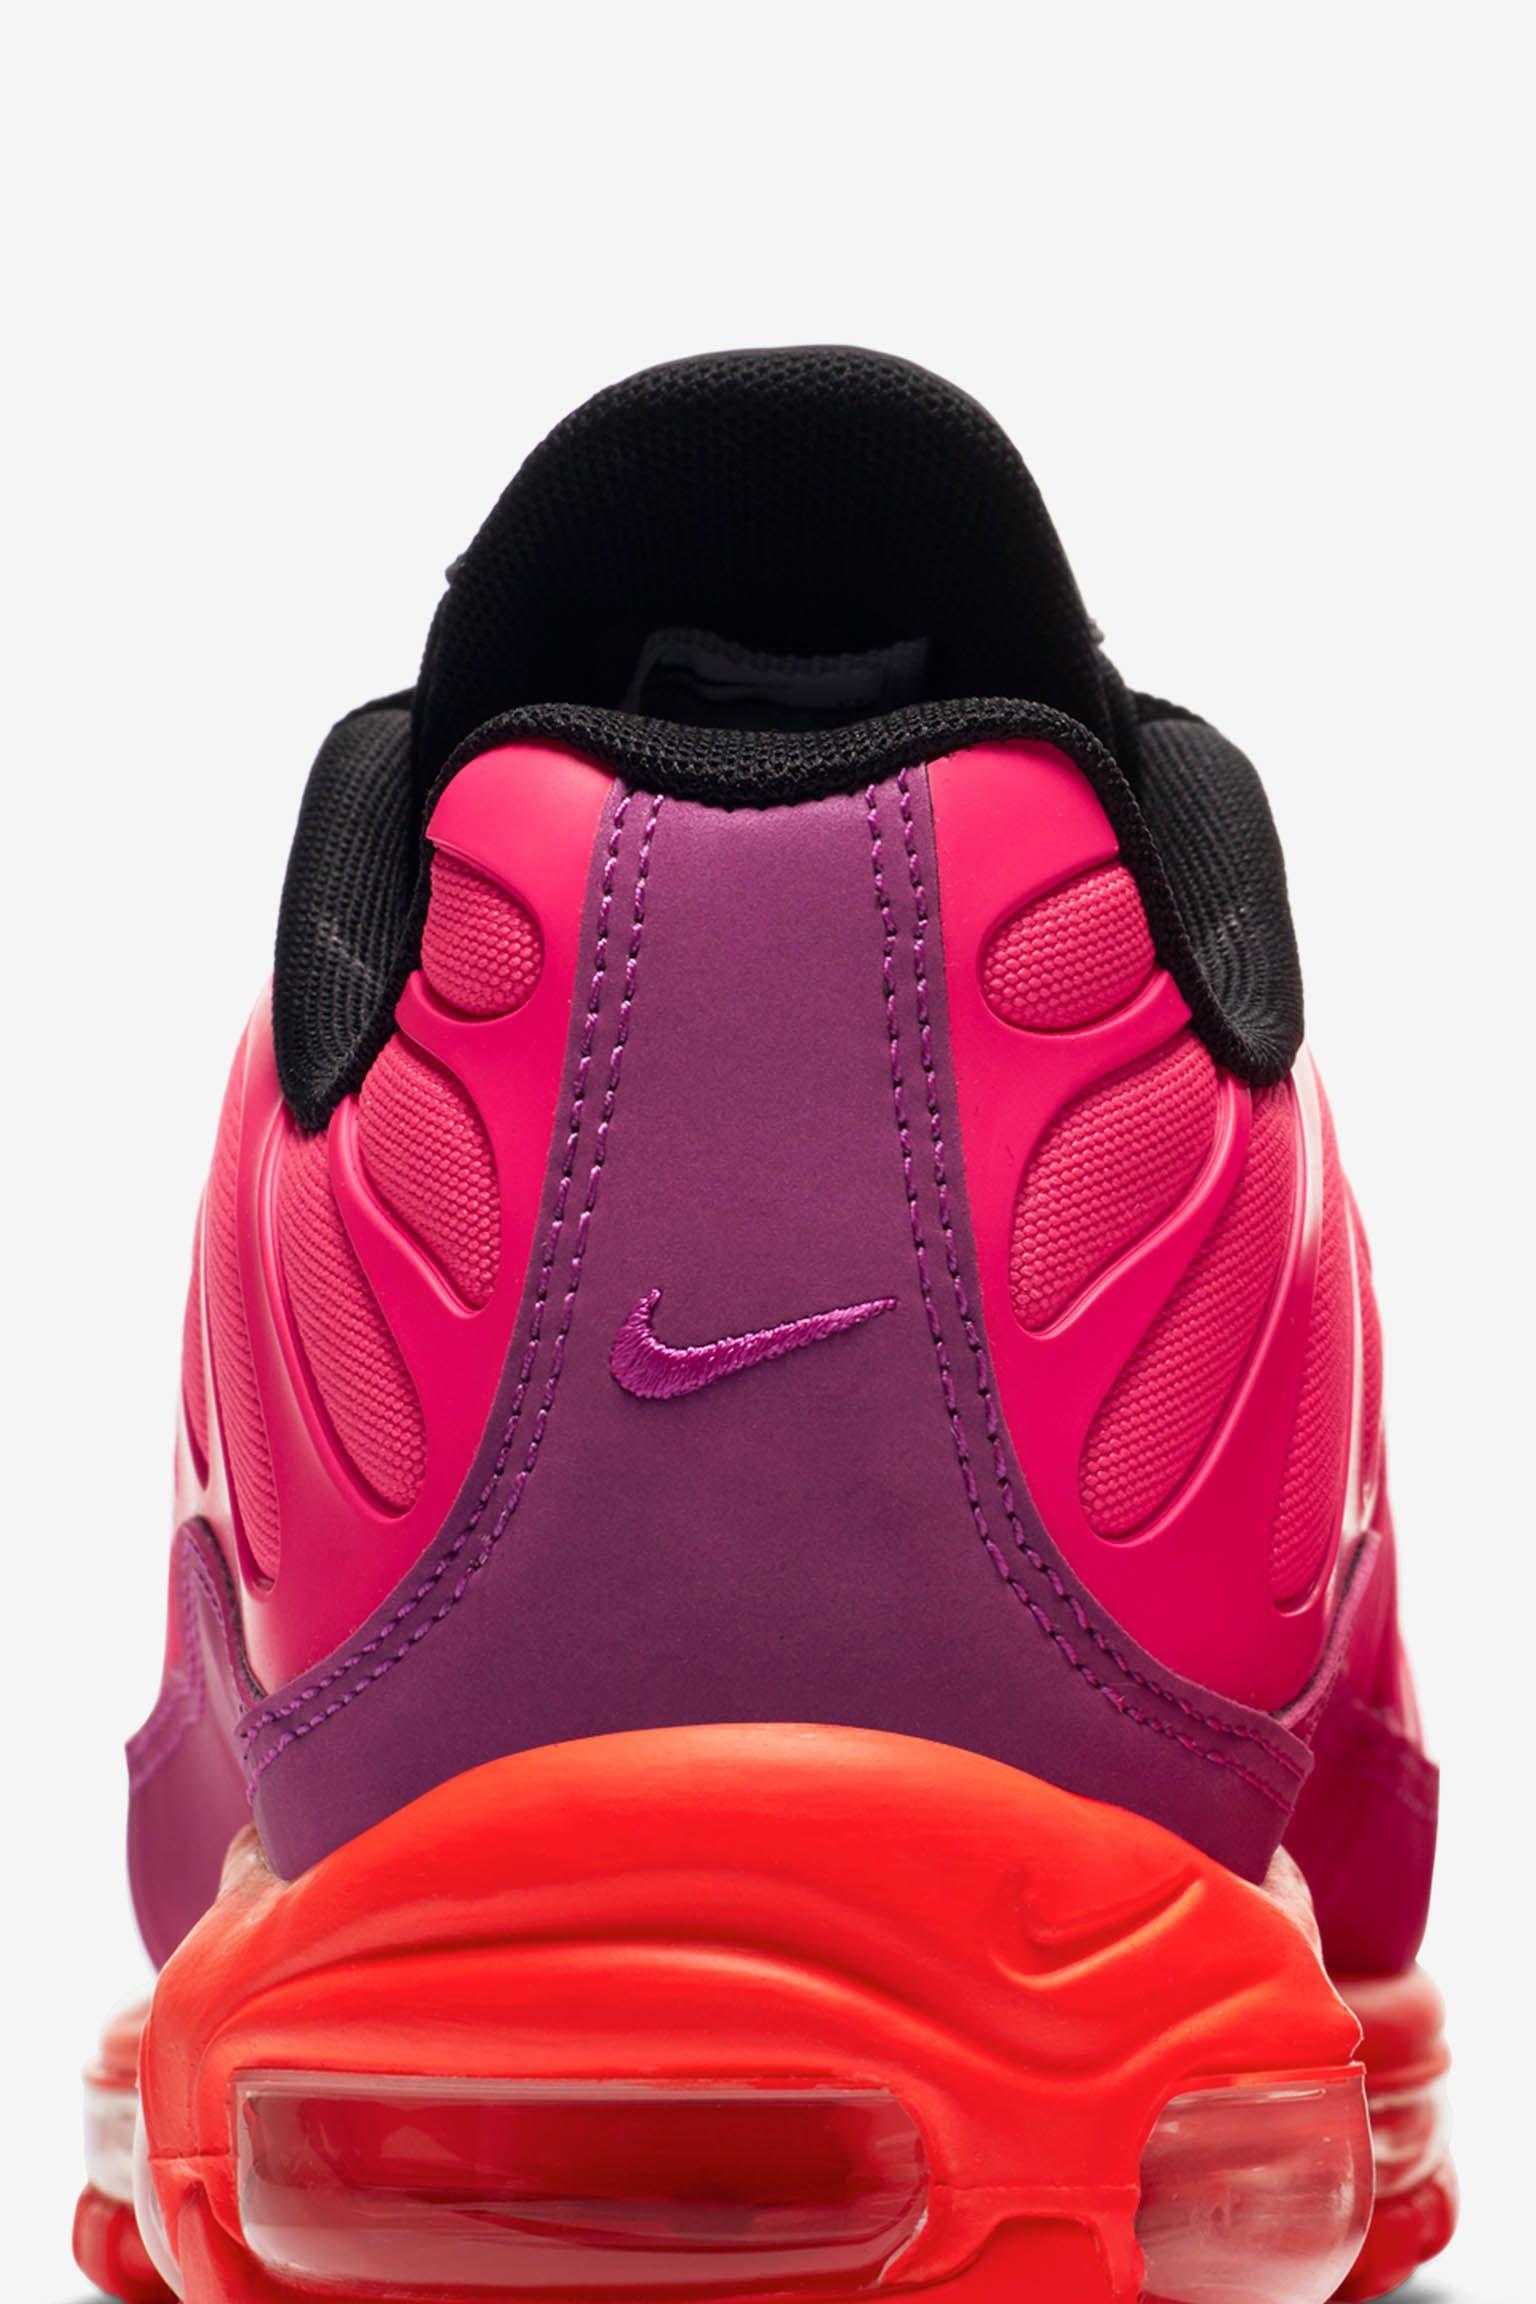 Nike Air Max 97 / Plus 'Racer Pink & Hyper Magenta' Release Date ...